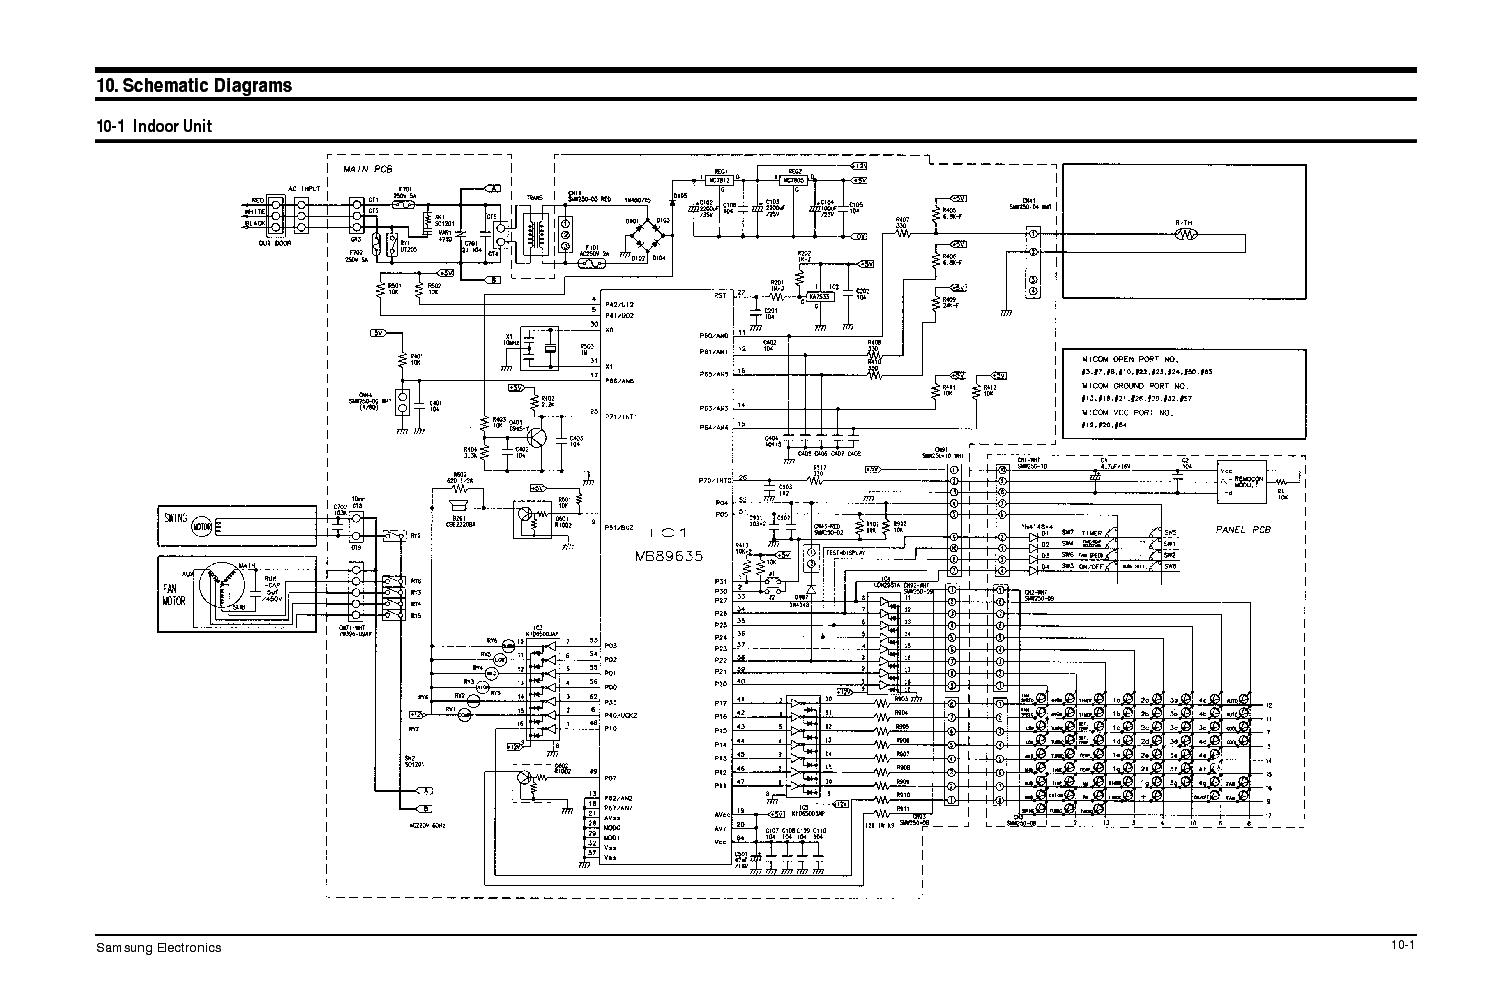 samsung p805j modul sch service manual download